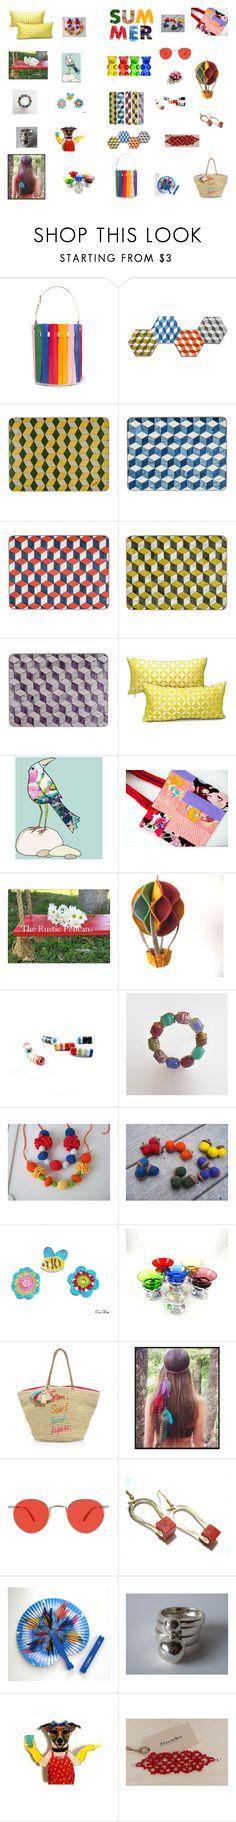 """Rainbow colours for summer"" by einder on Polyvore featuring interior, interiors, interior design, home, home decor, interior decorating, Sara Battaglia, SAM., Rebecca Minkoff and Garrett Leight"